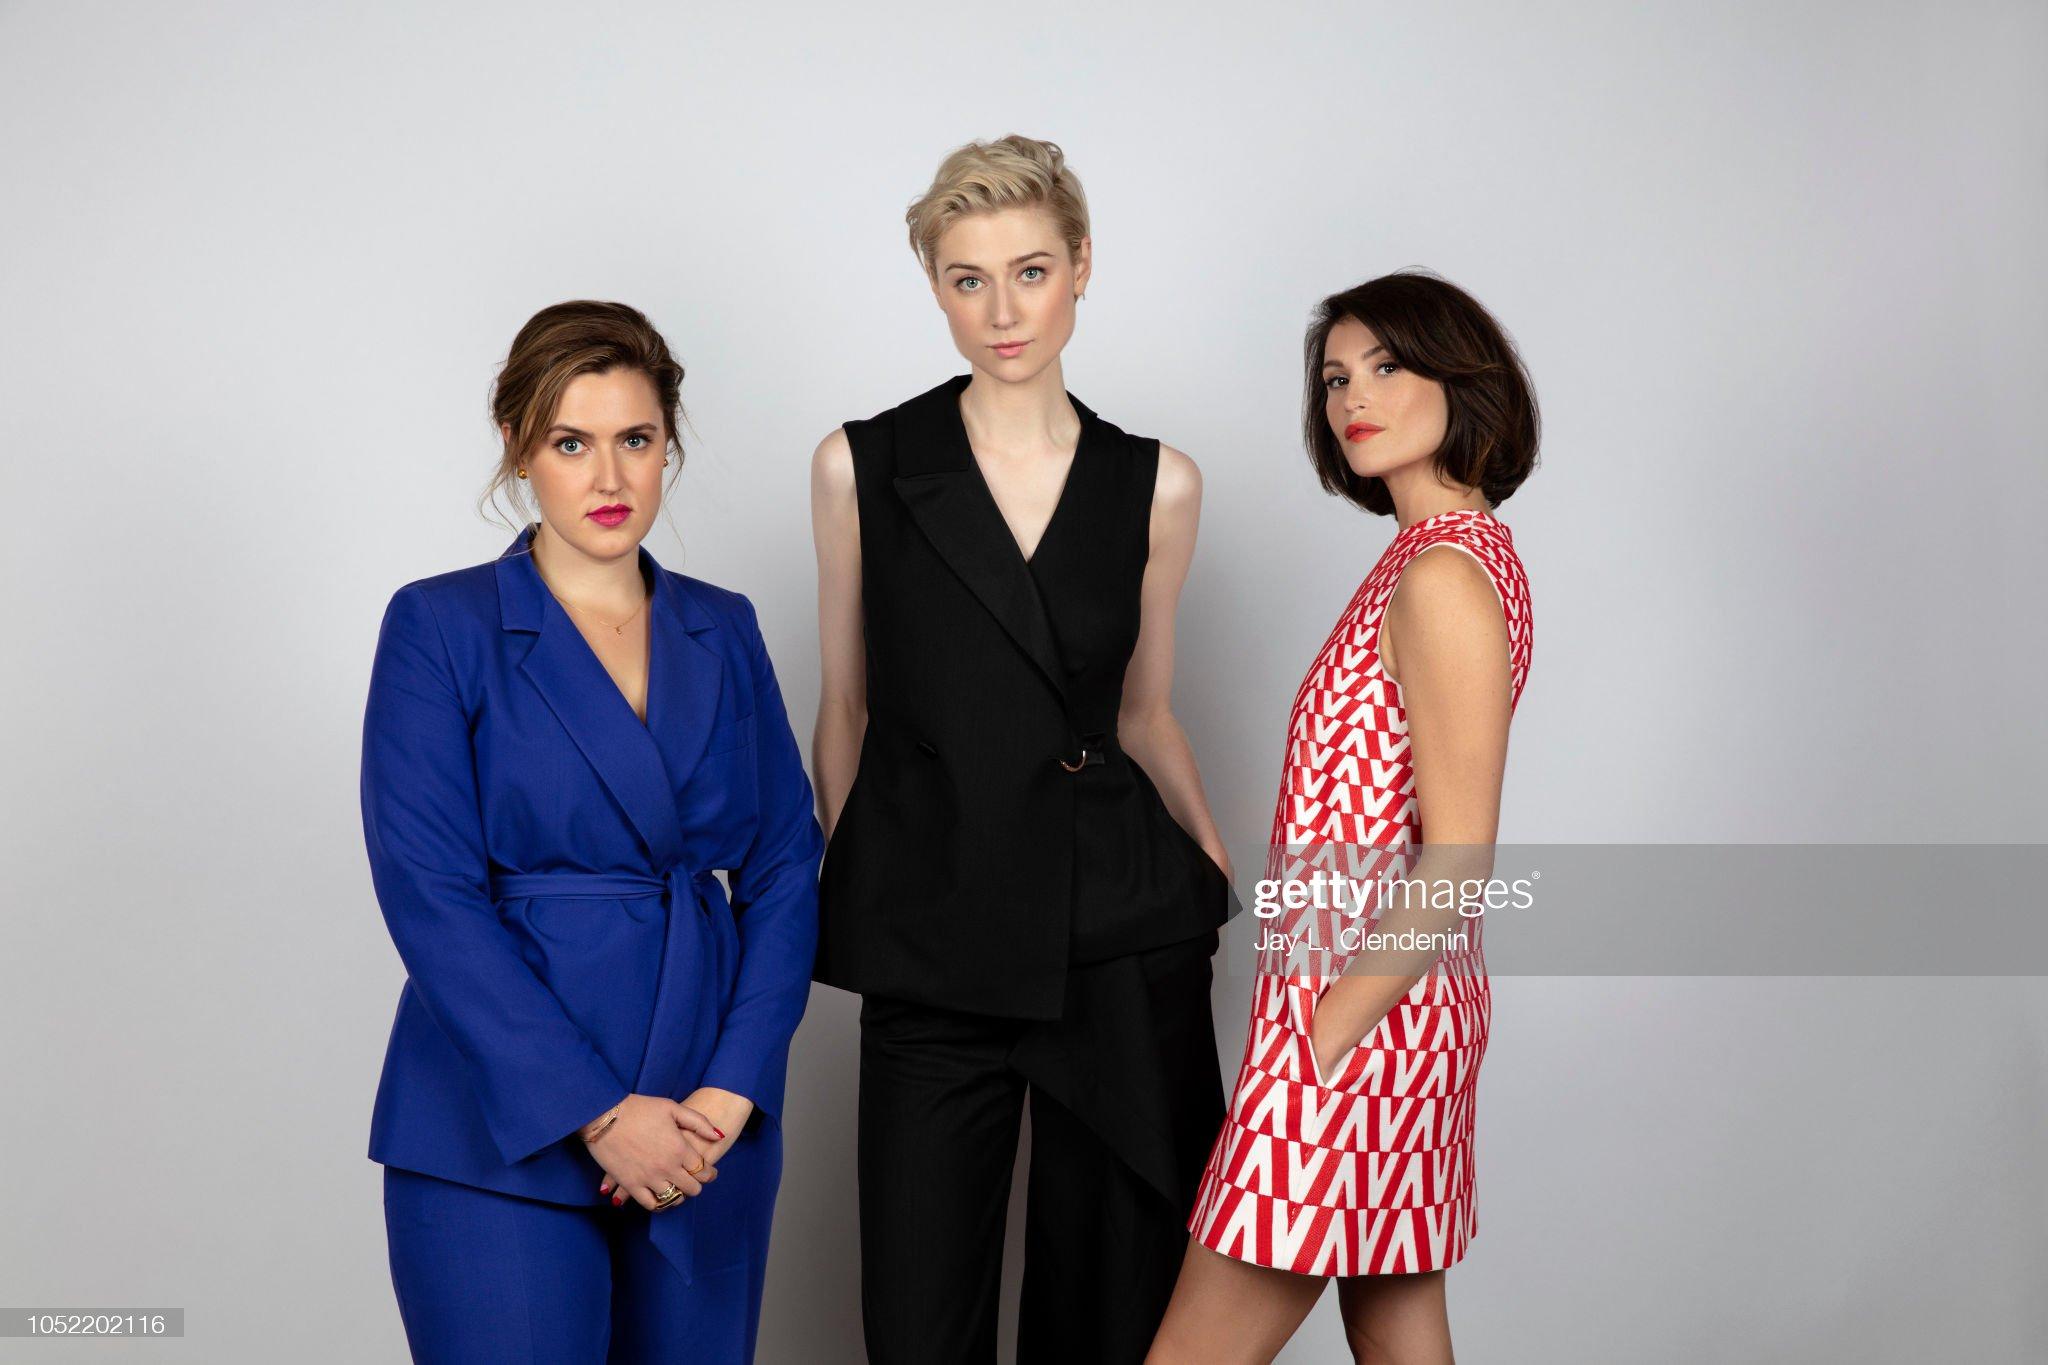 director-chanya-button-actresses-elizabeth-debicki-and-gemma-arterton-picture-id1052202116